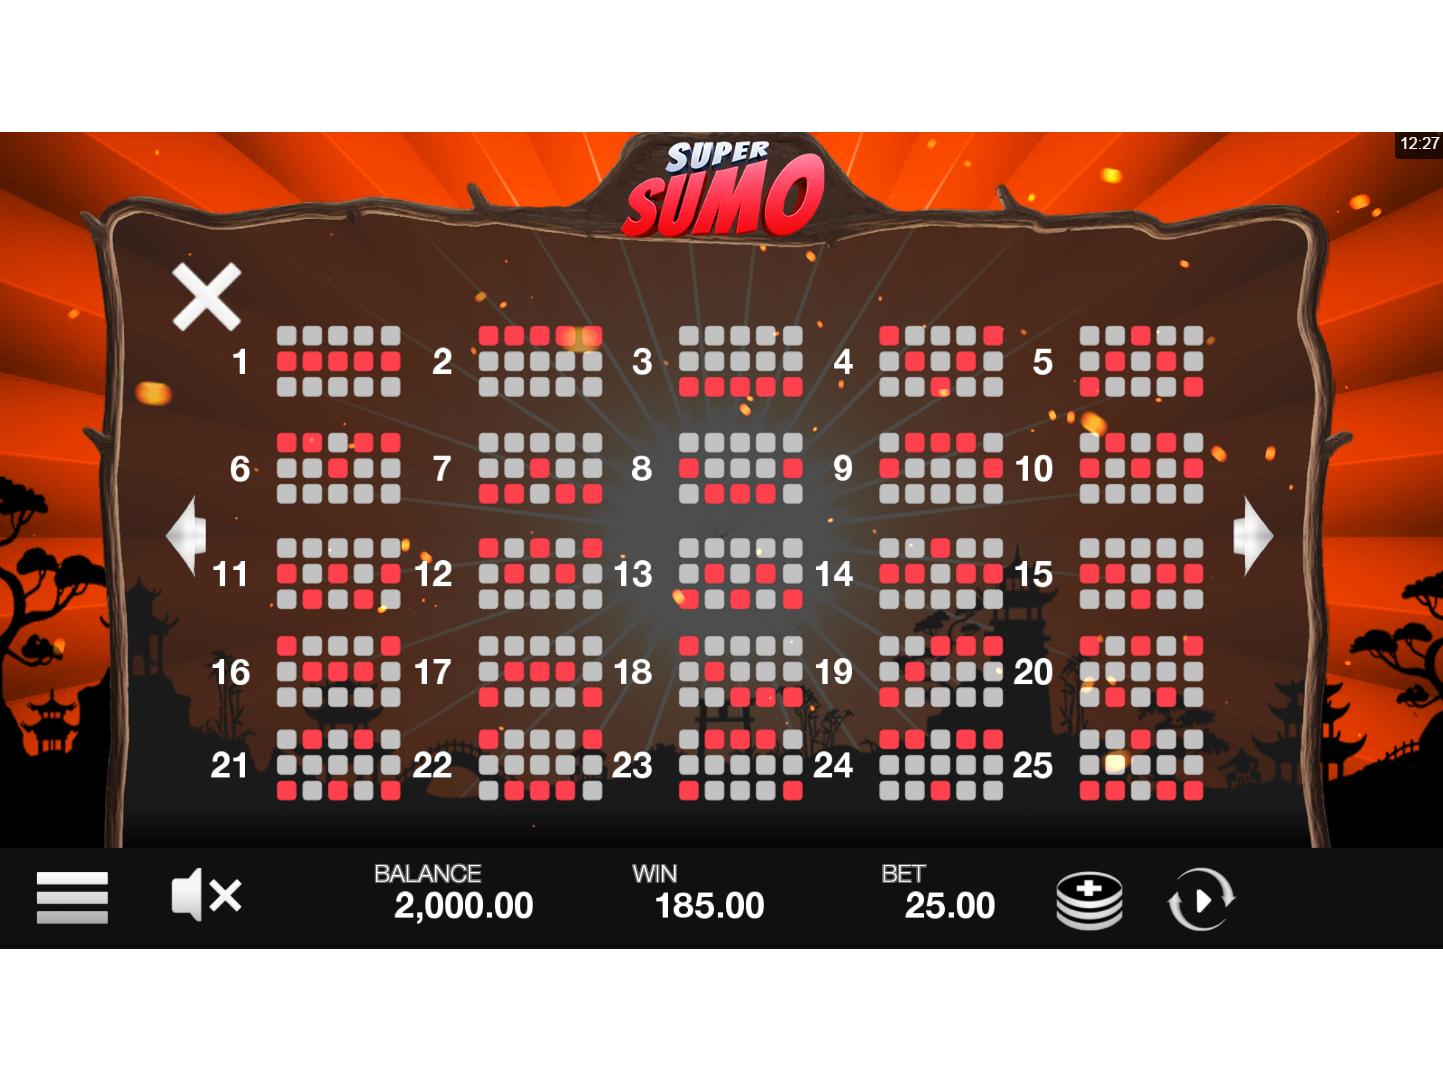 play Super Sumo online